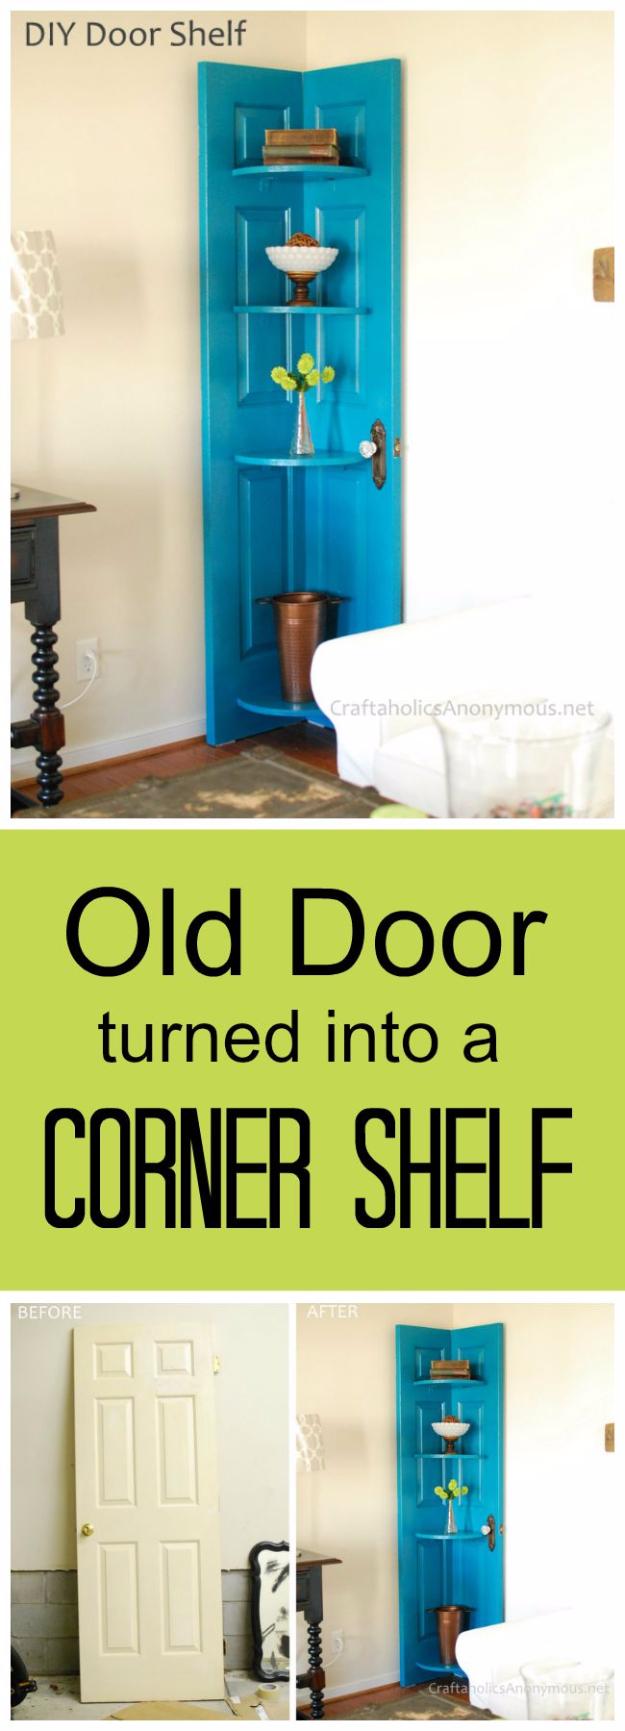 diy shelves and do it yourself shelving ideas   diy corner door shelf